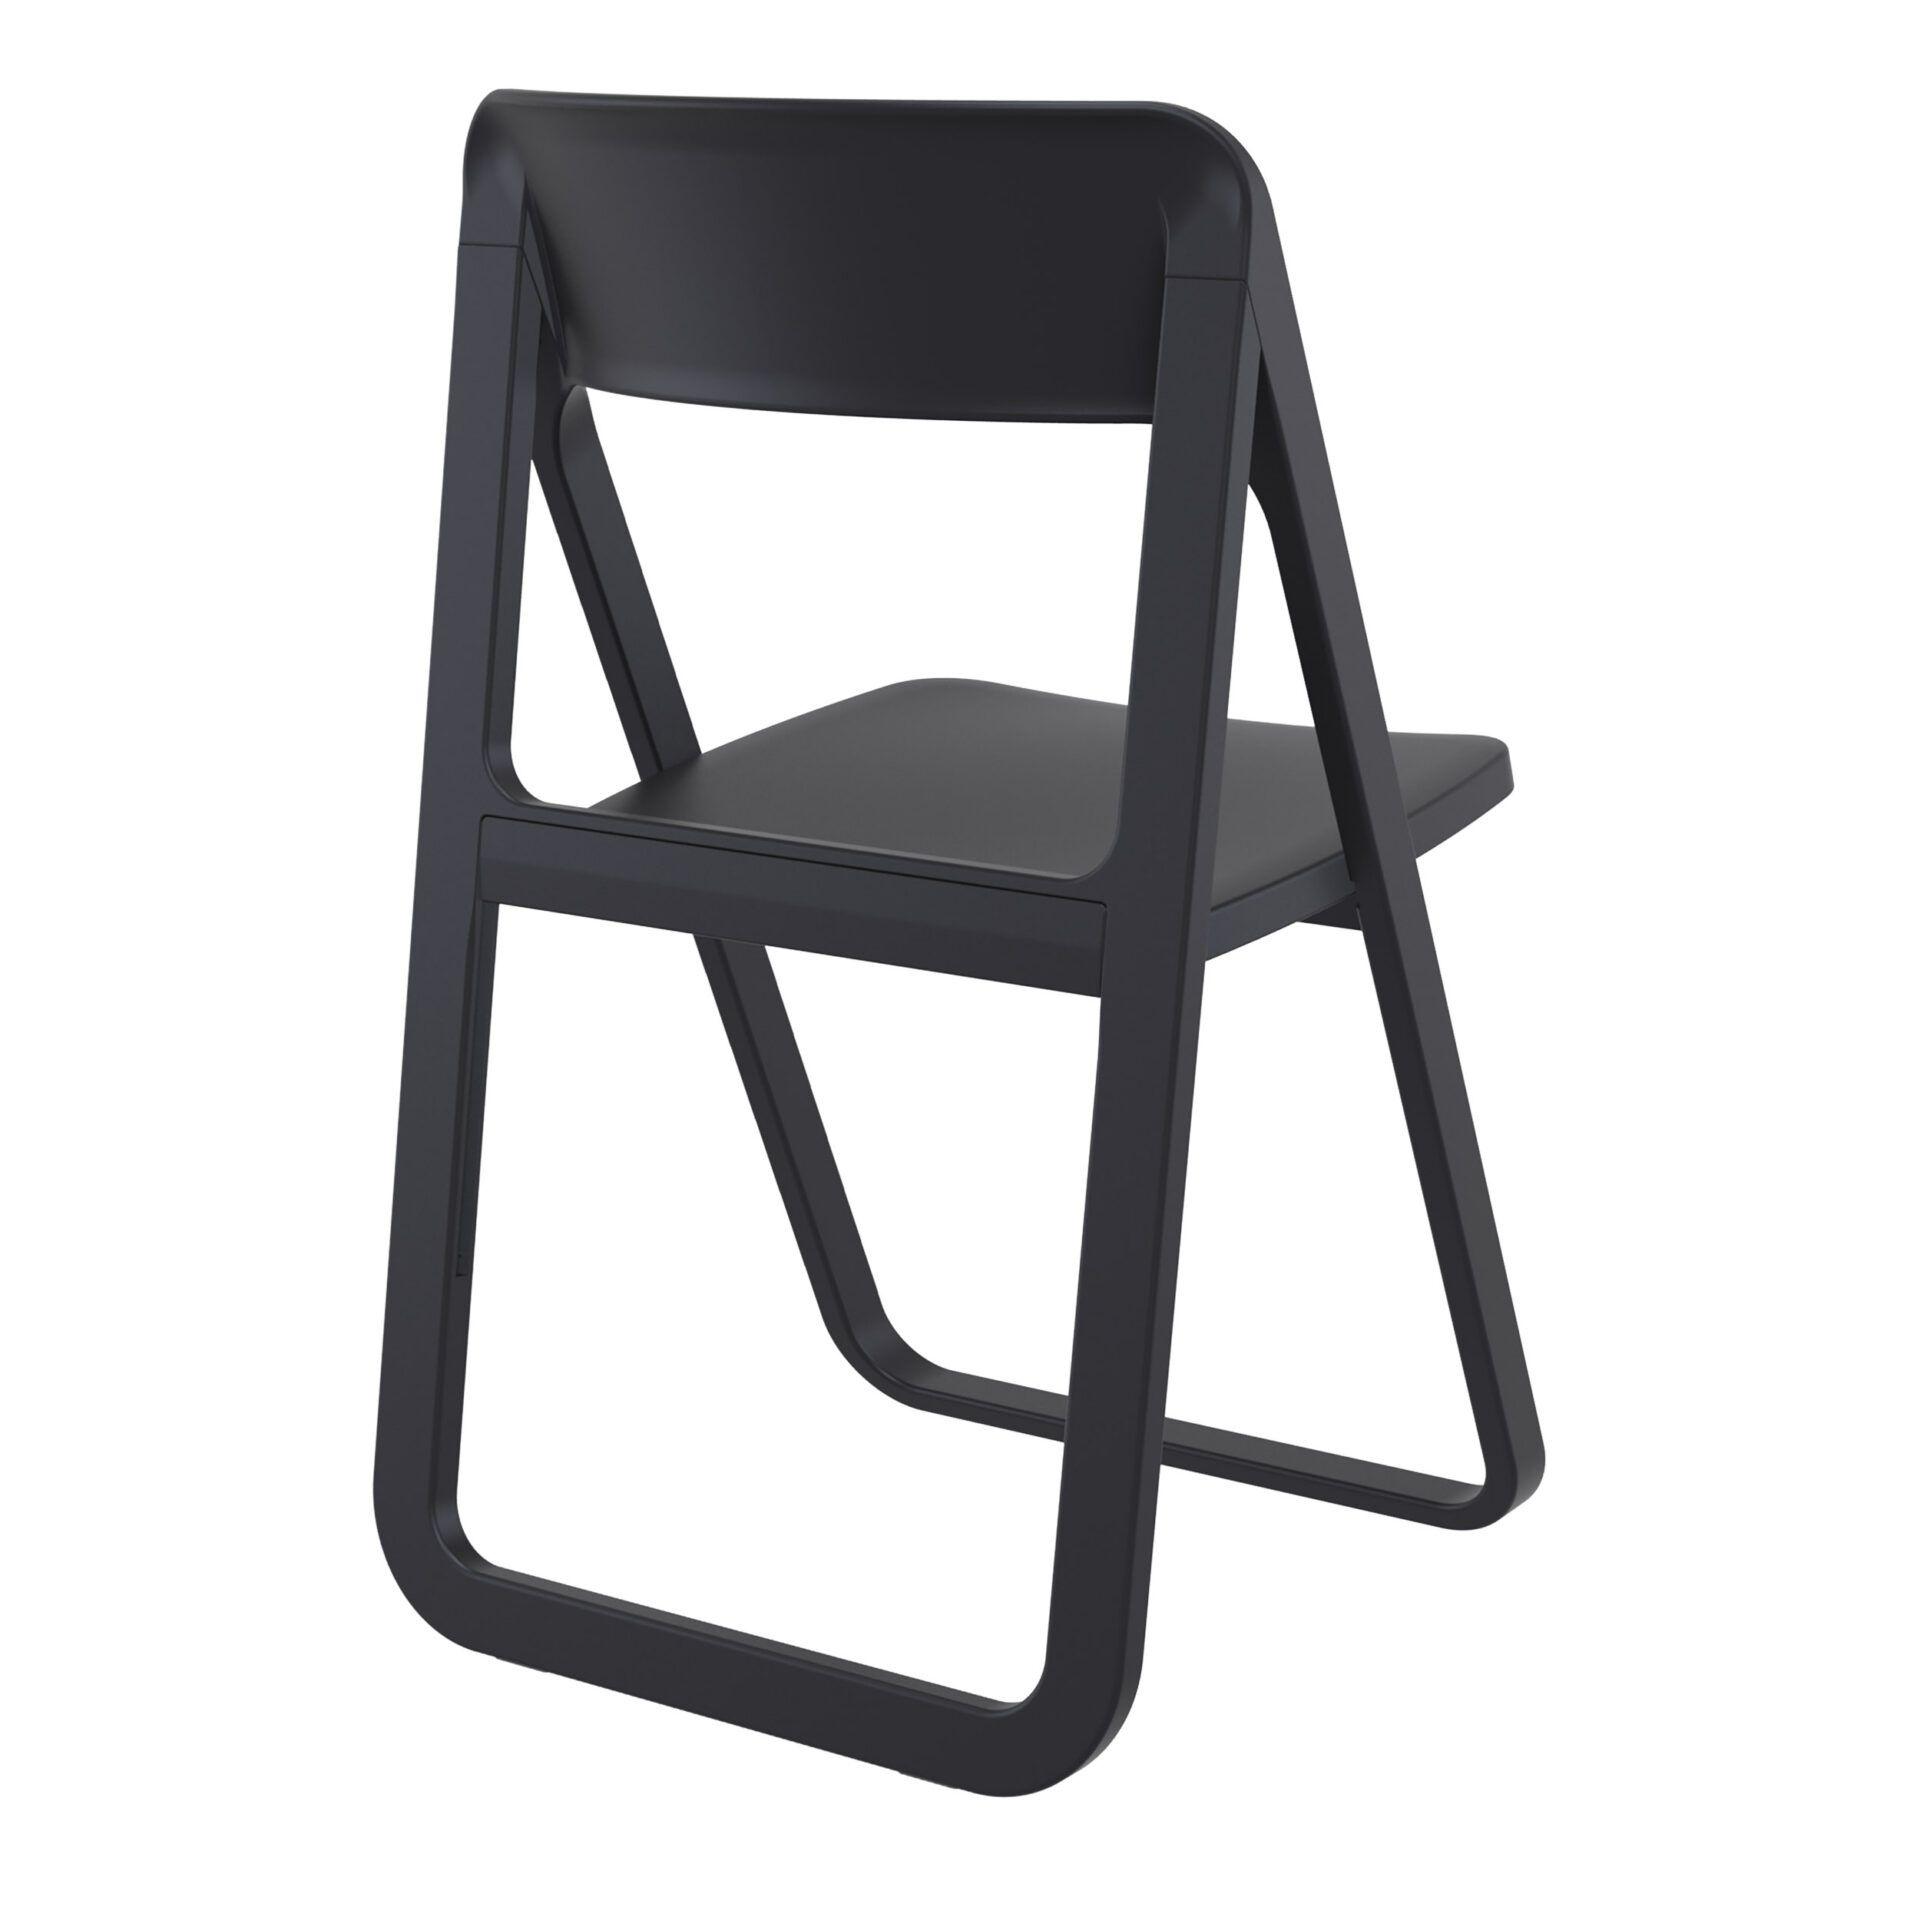 polypropylene dream folding chair black back side